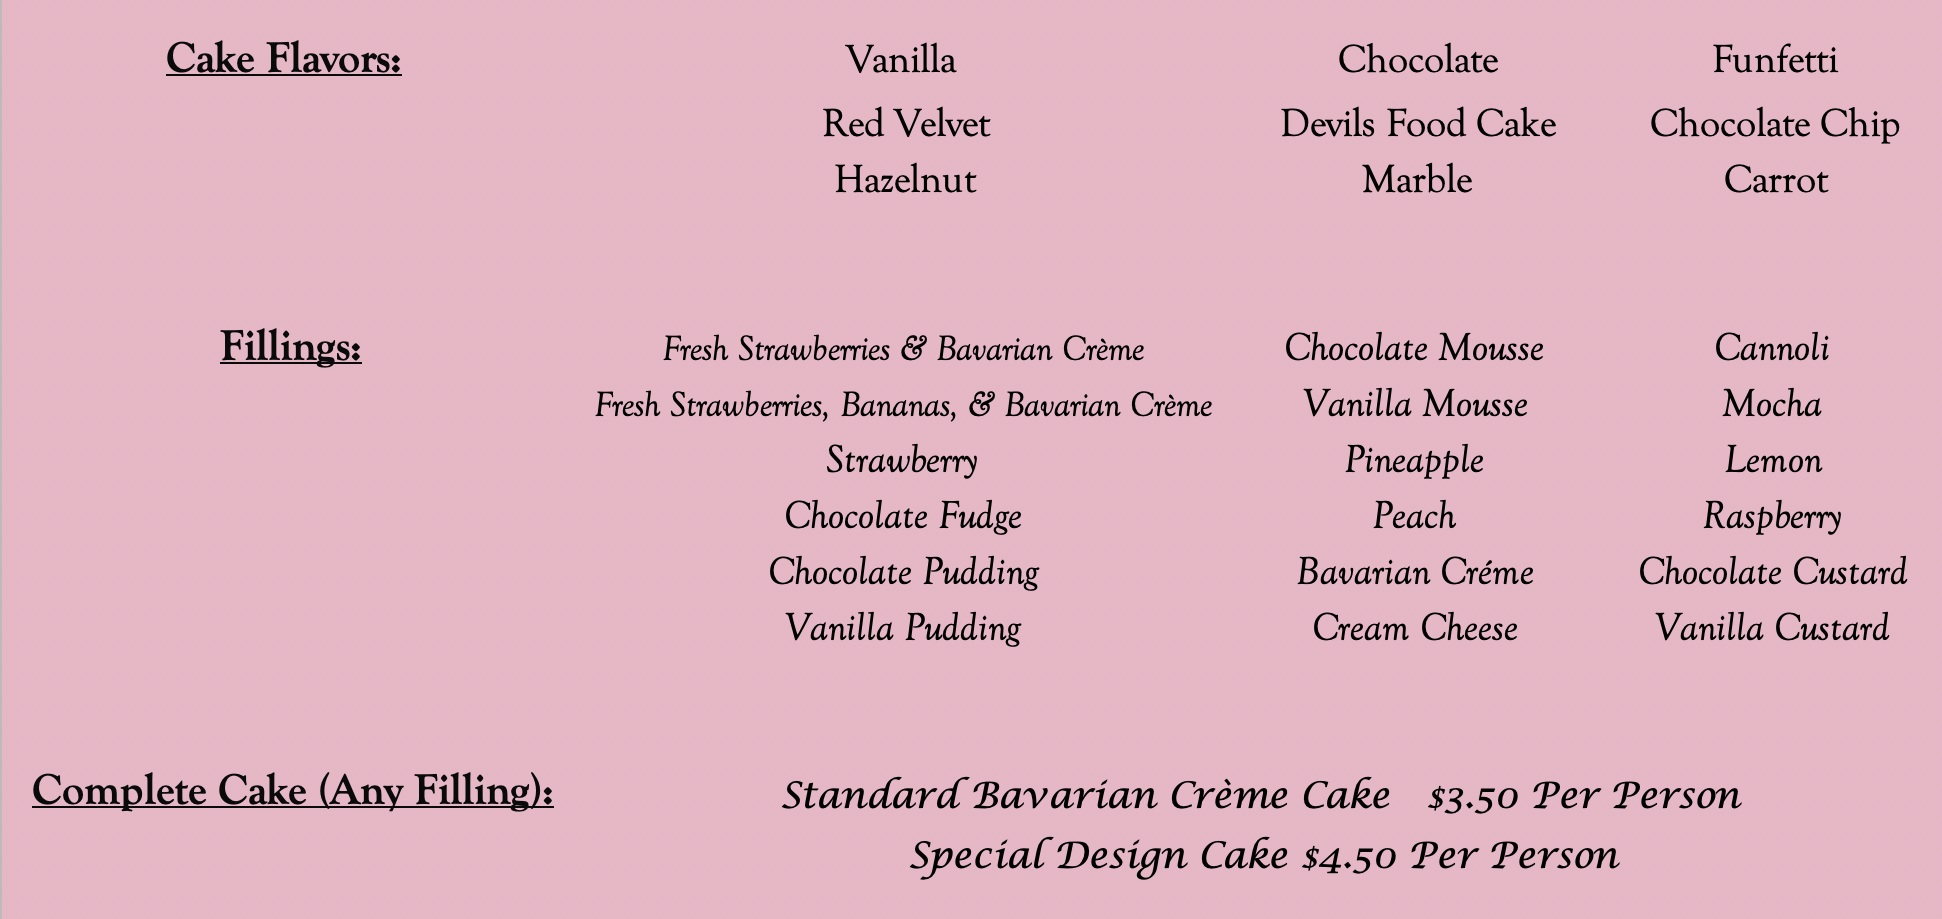 Rudy's Pastry Shop Cake Flavors & Fillings.jpg